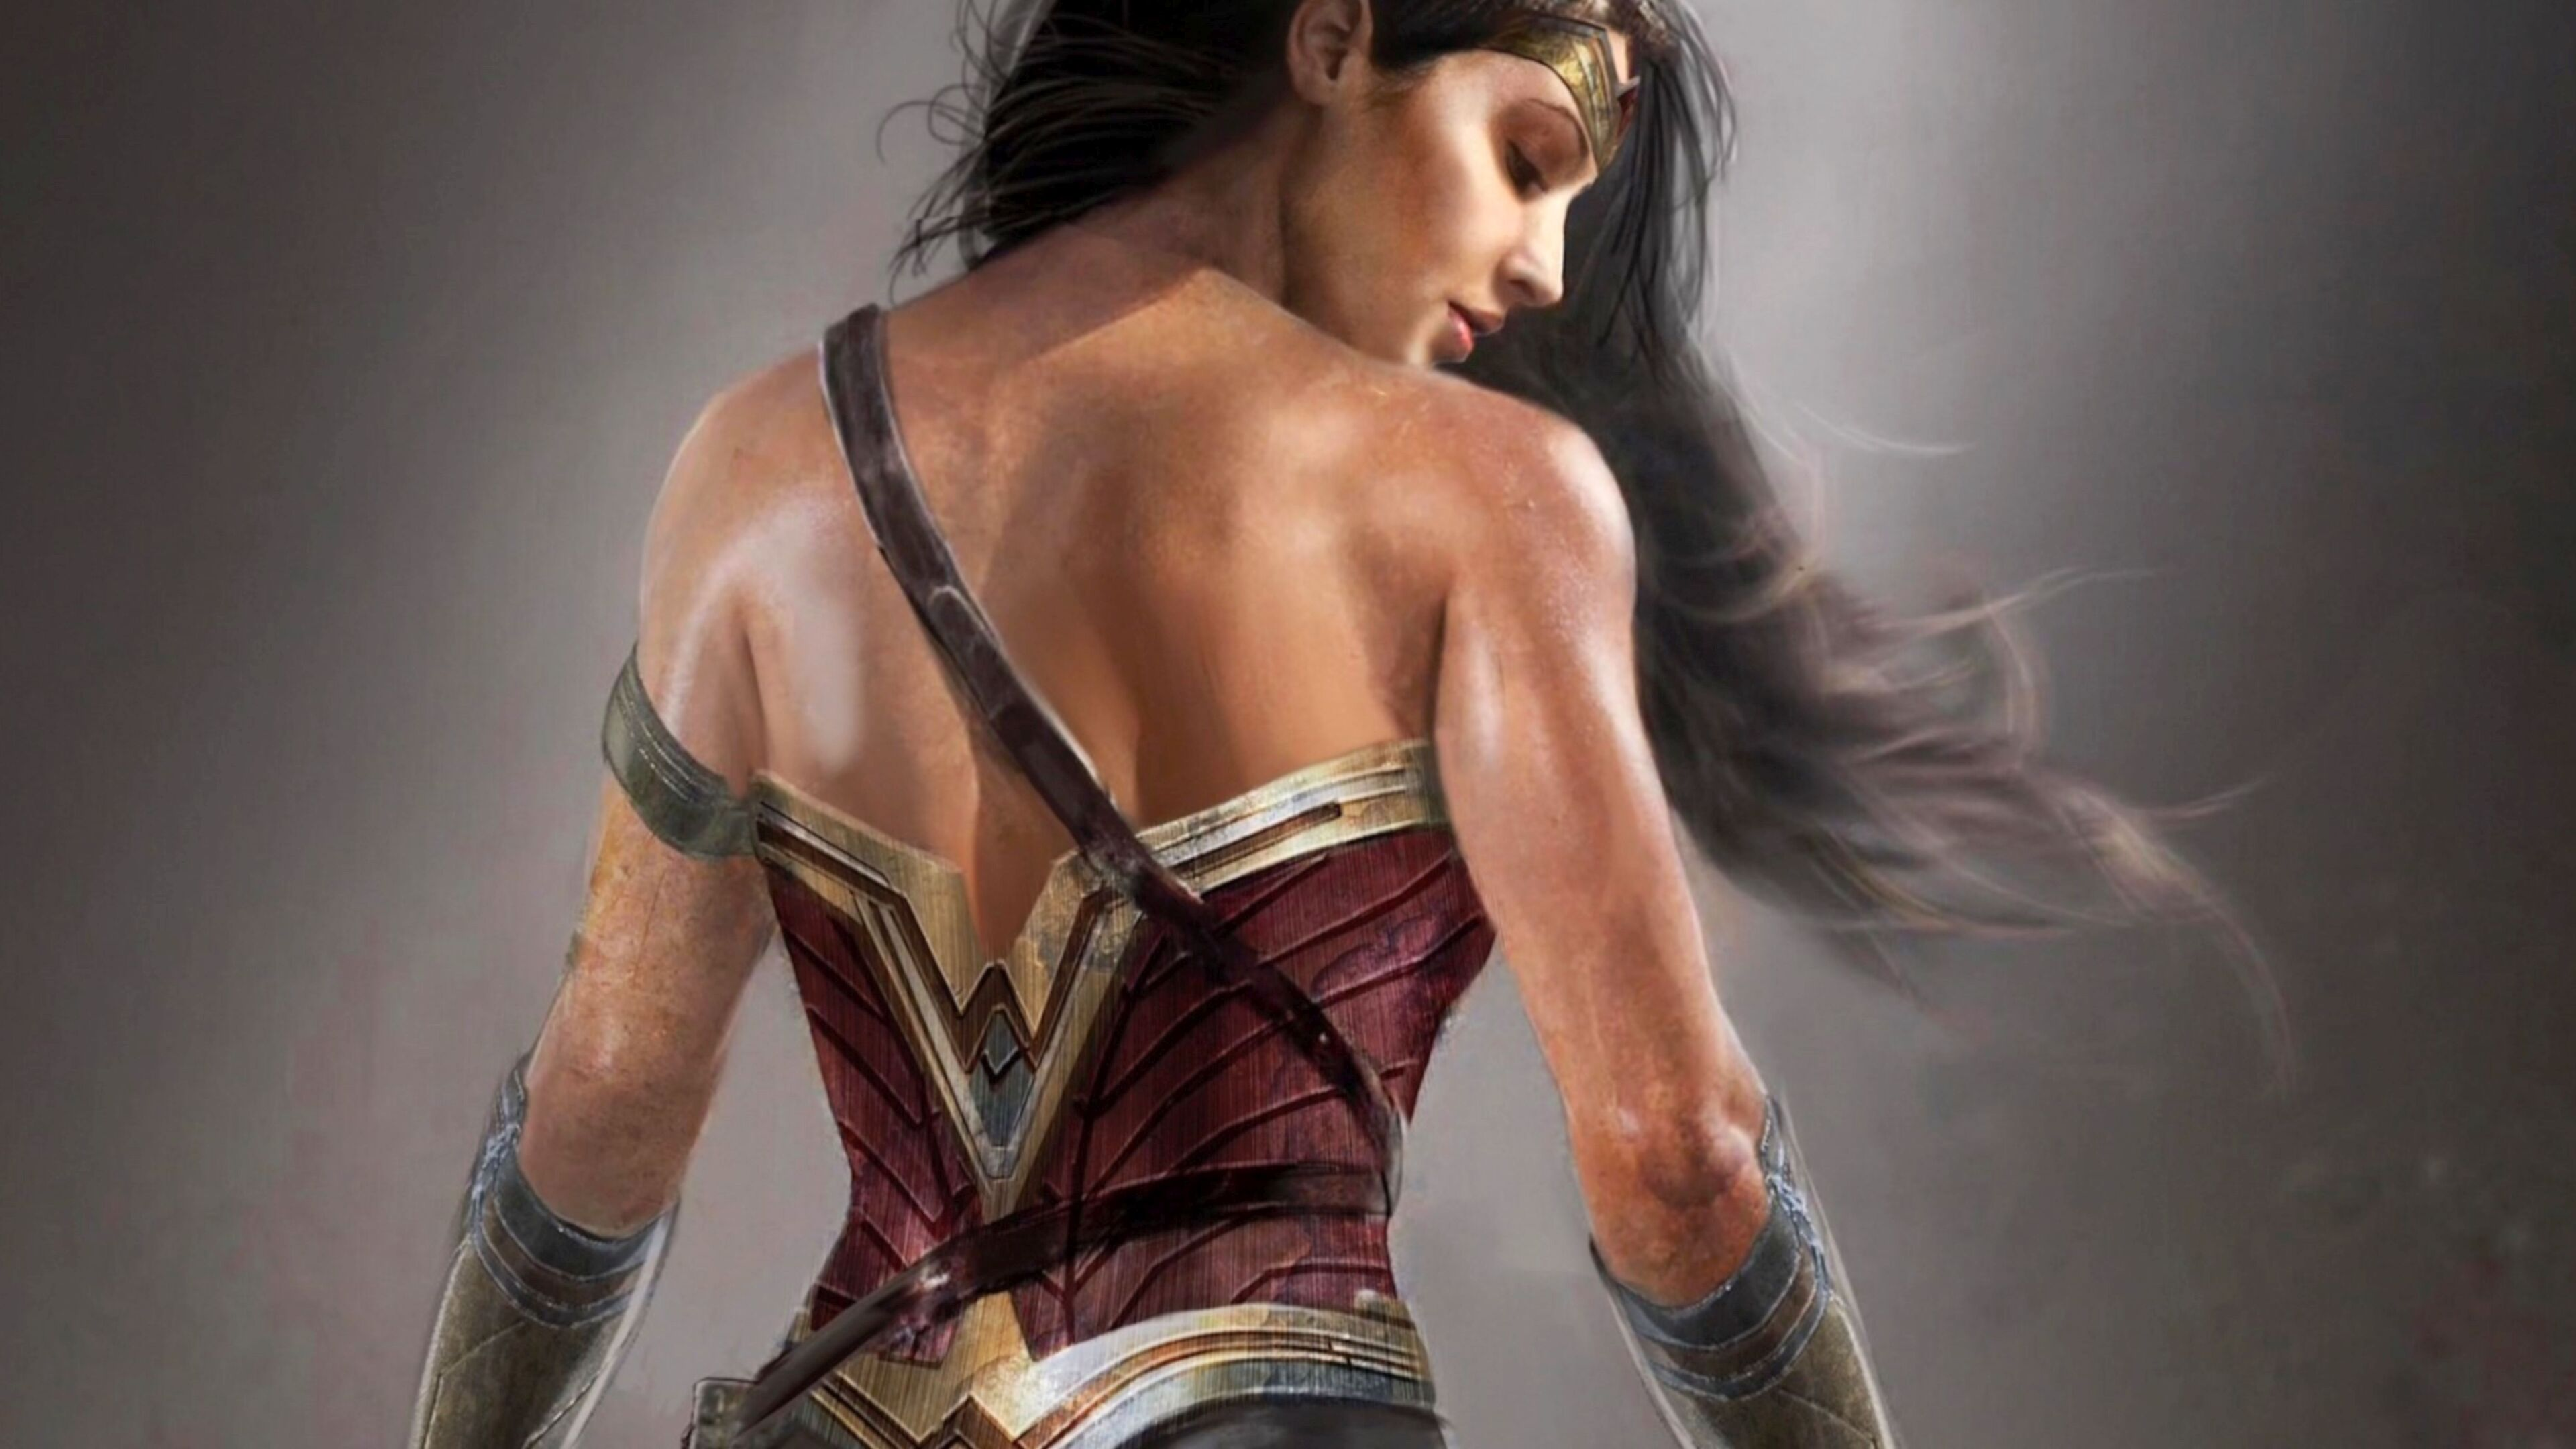 3840x2160 Gal Gadot Wonder Woman Artwork 4k Hd 4k Wallpapers Images